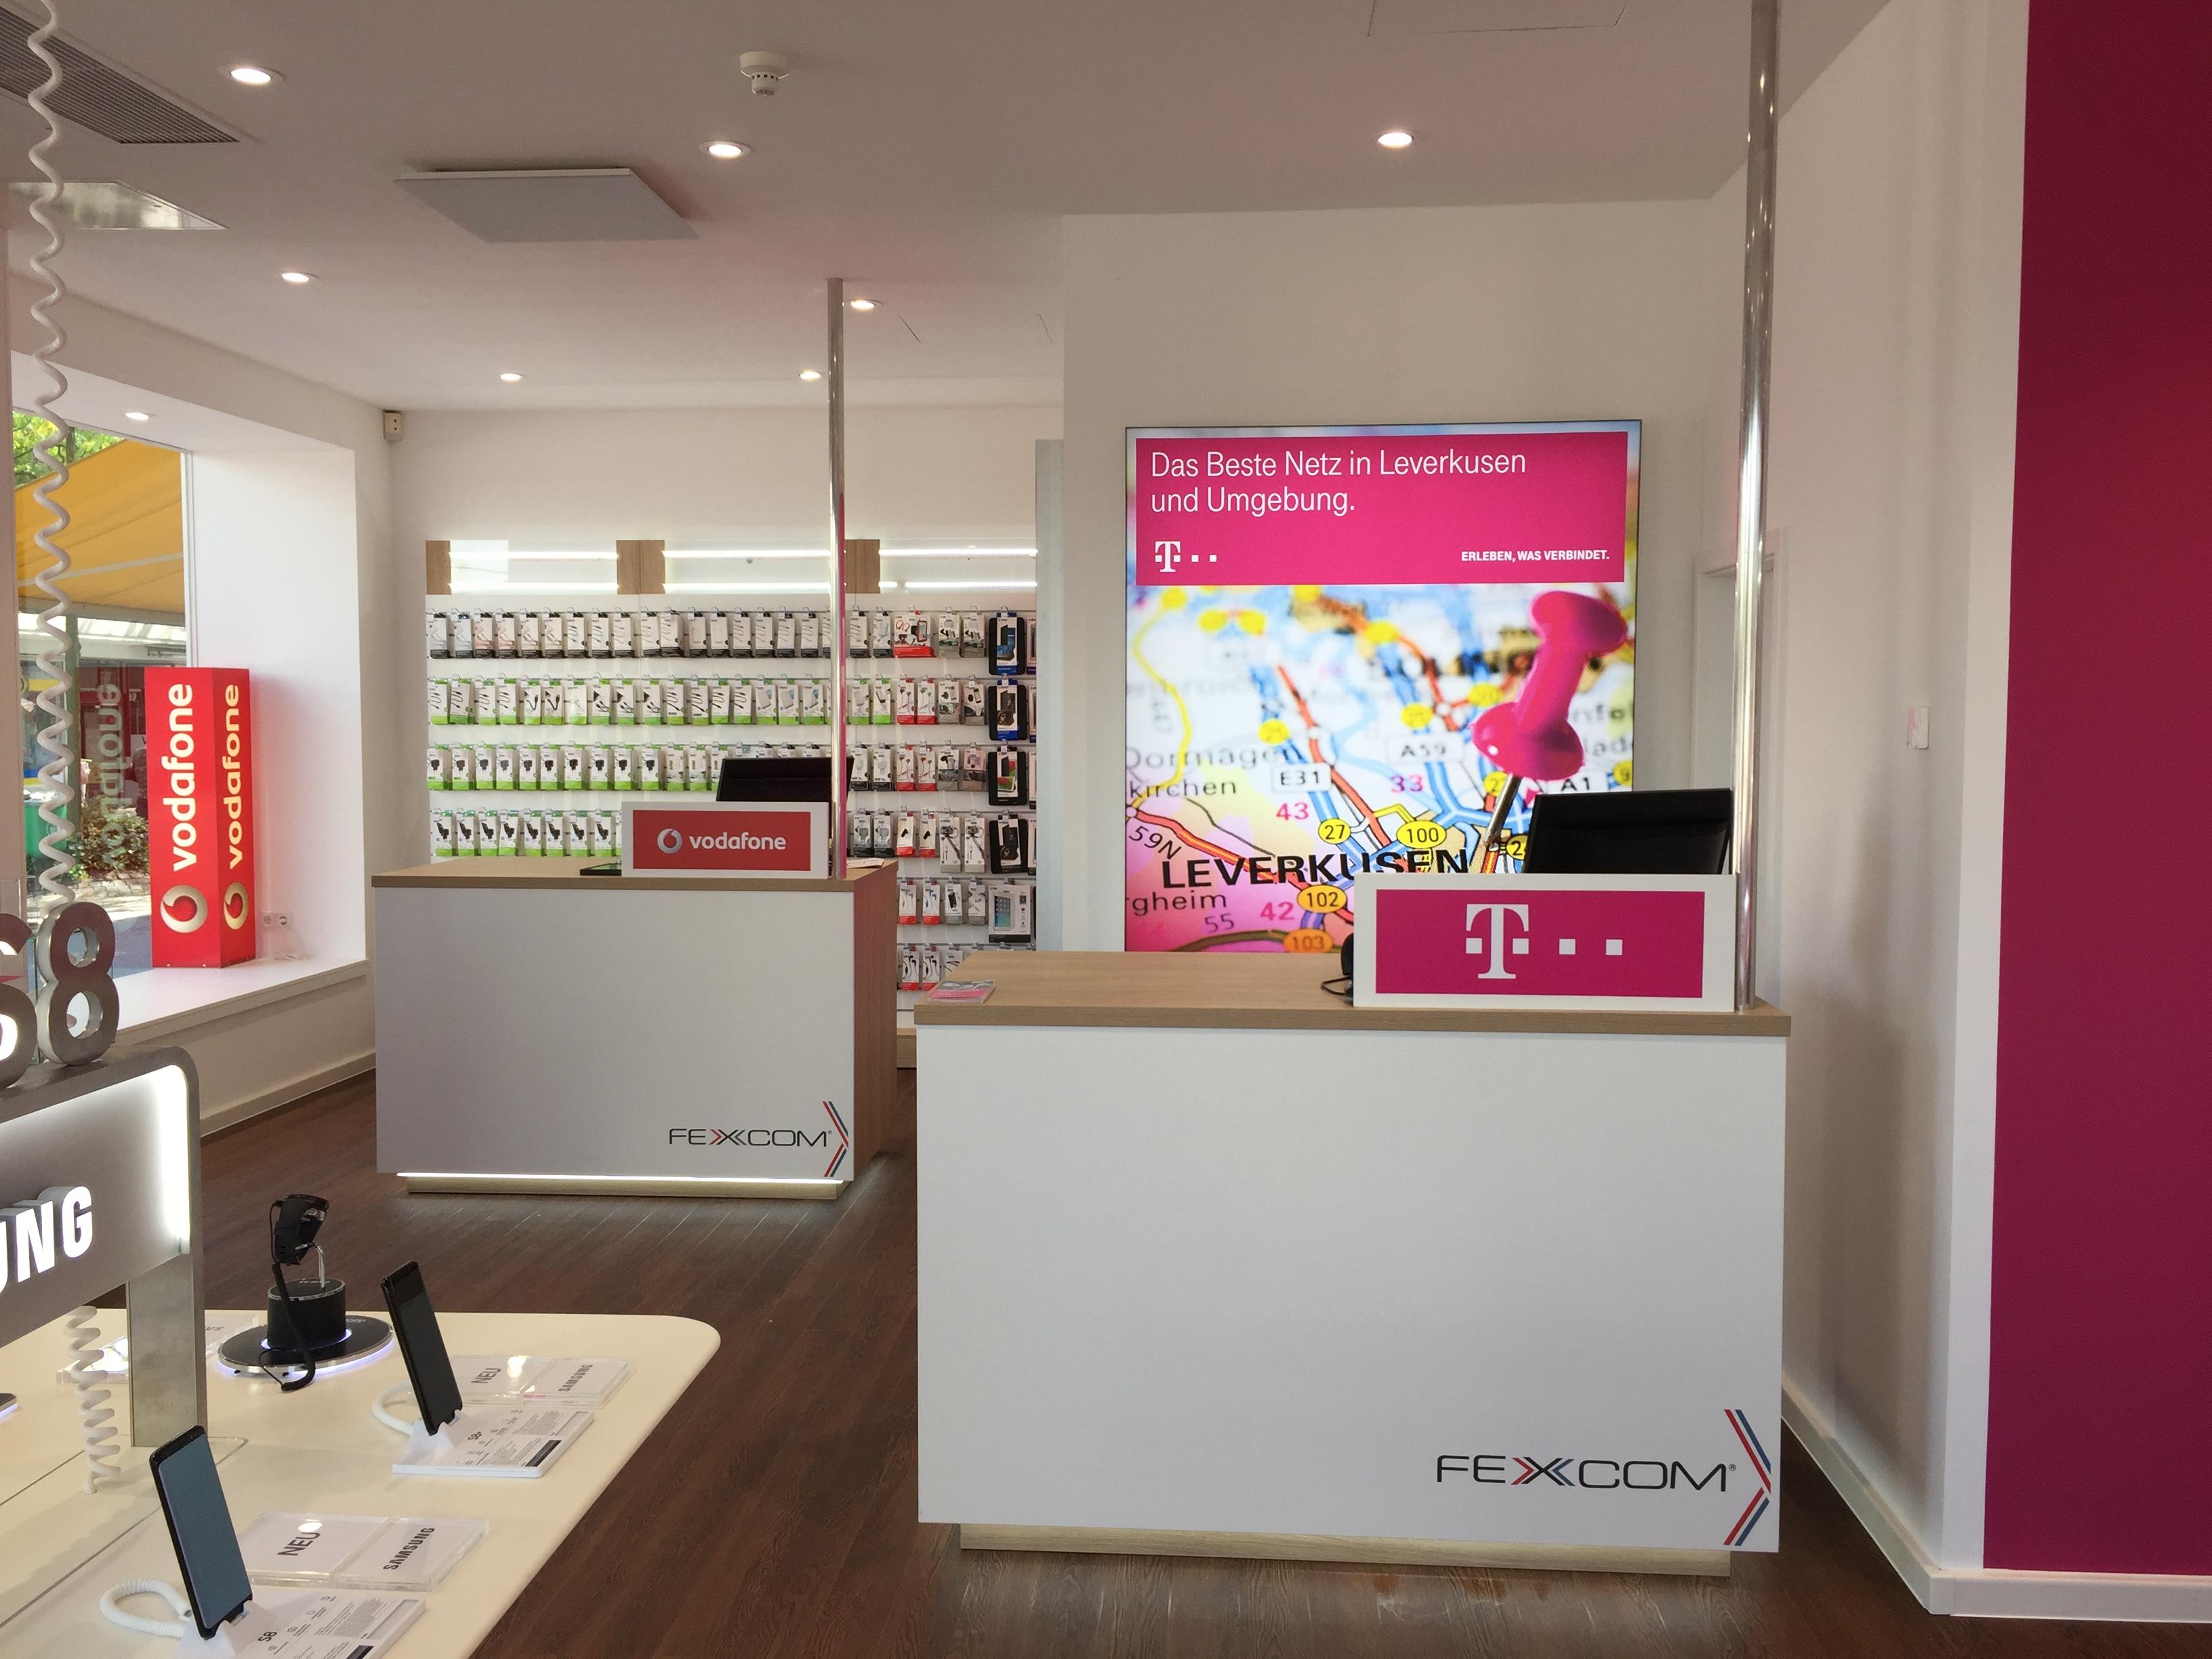 Mobilfunkshop FEXCOM Leverkusen